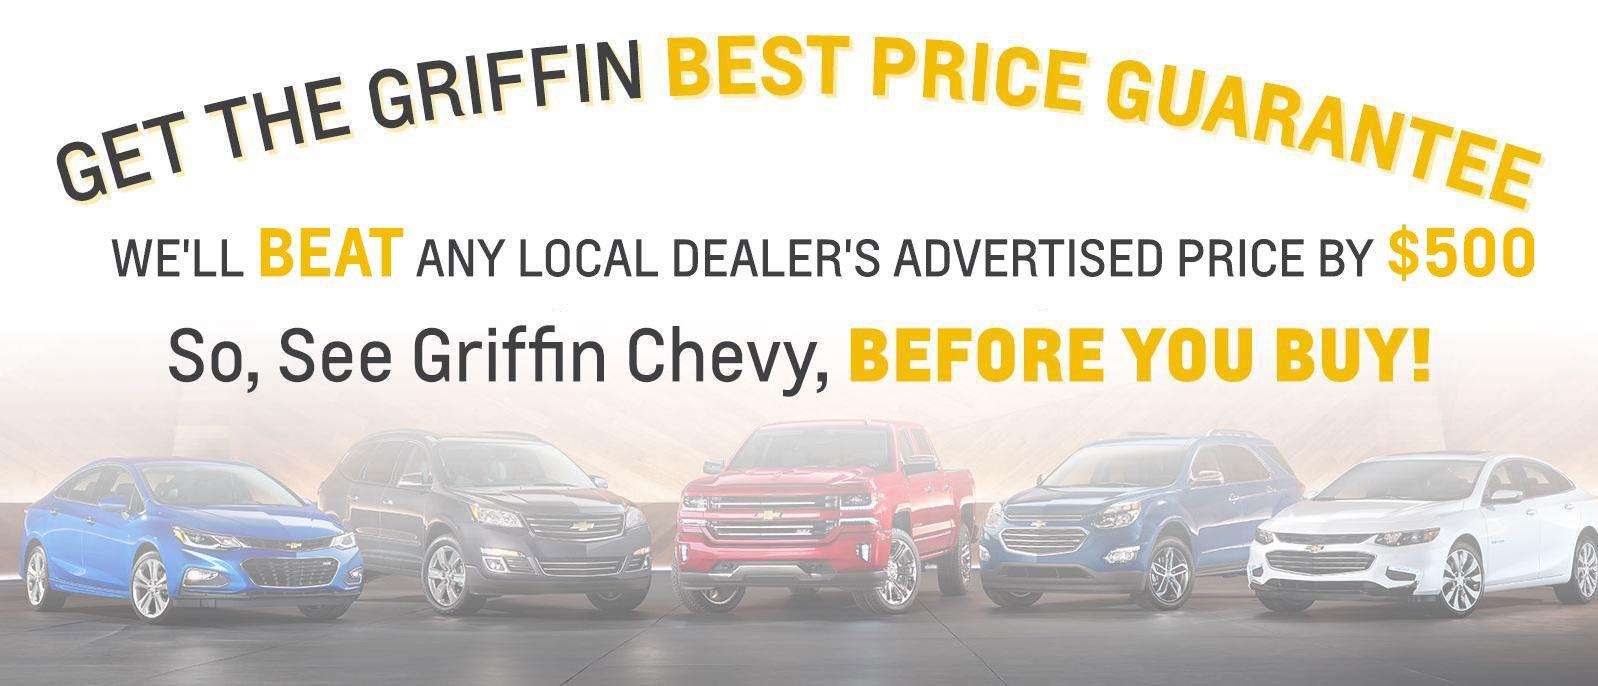 Chevy Dealer Milwaukee >> Chevy Dealership Milwaukee Wi Griffin Chevrolet Griffin